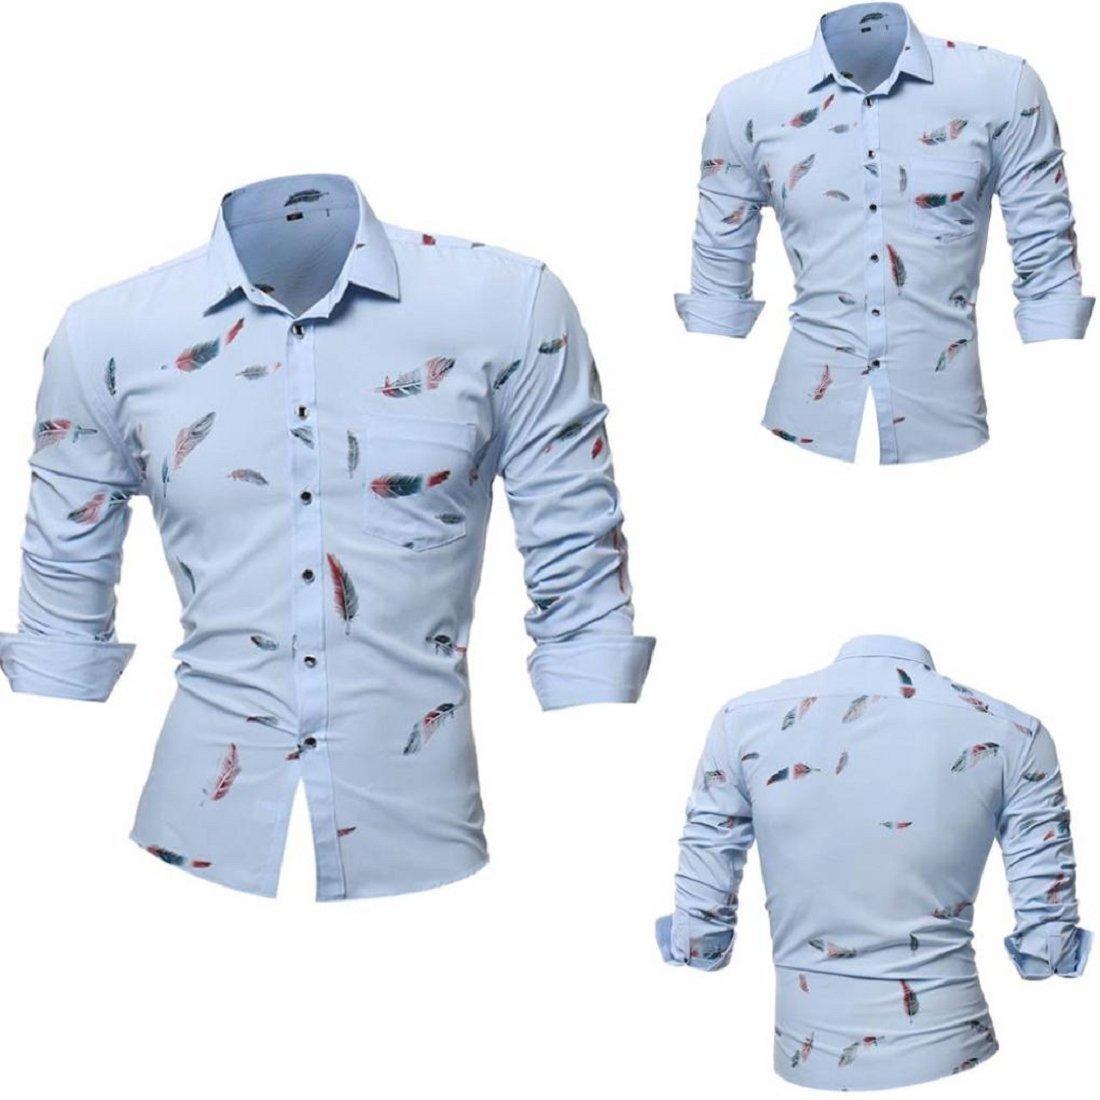 efd2352fcb6e Men's Stylish Long Sleeve Printed Dress Shirts Slim Fit Tops Basic Shirt  Blouse XWJ520 larger image